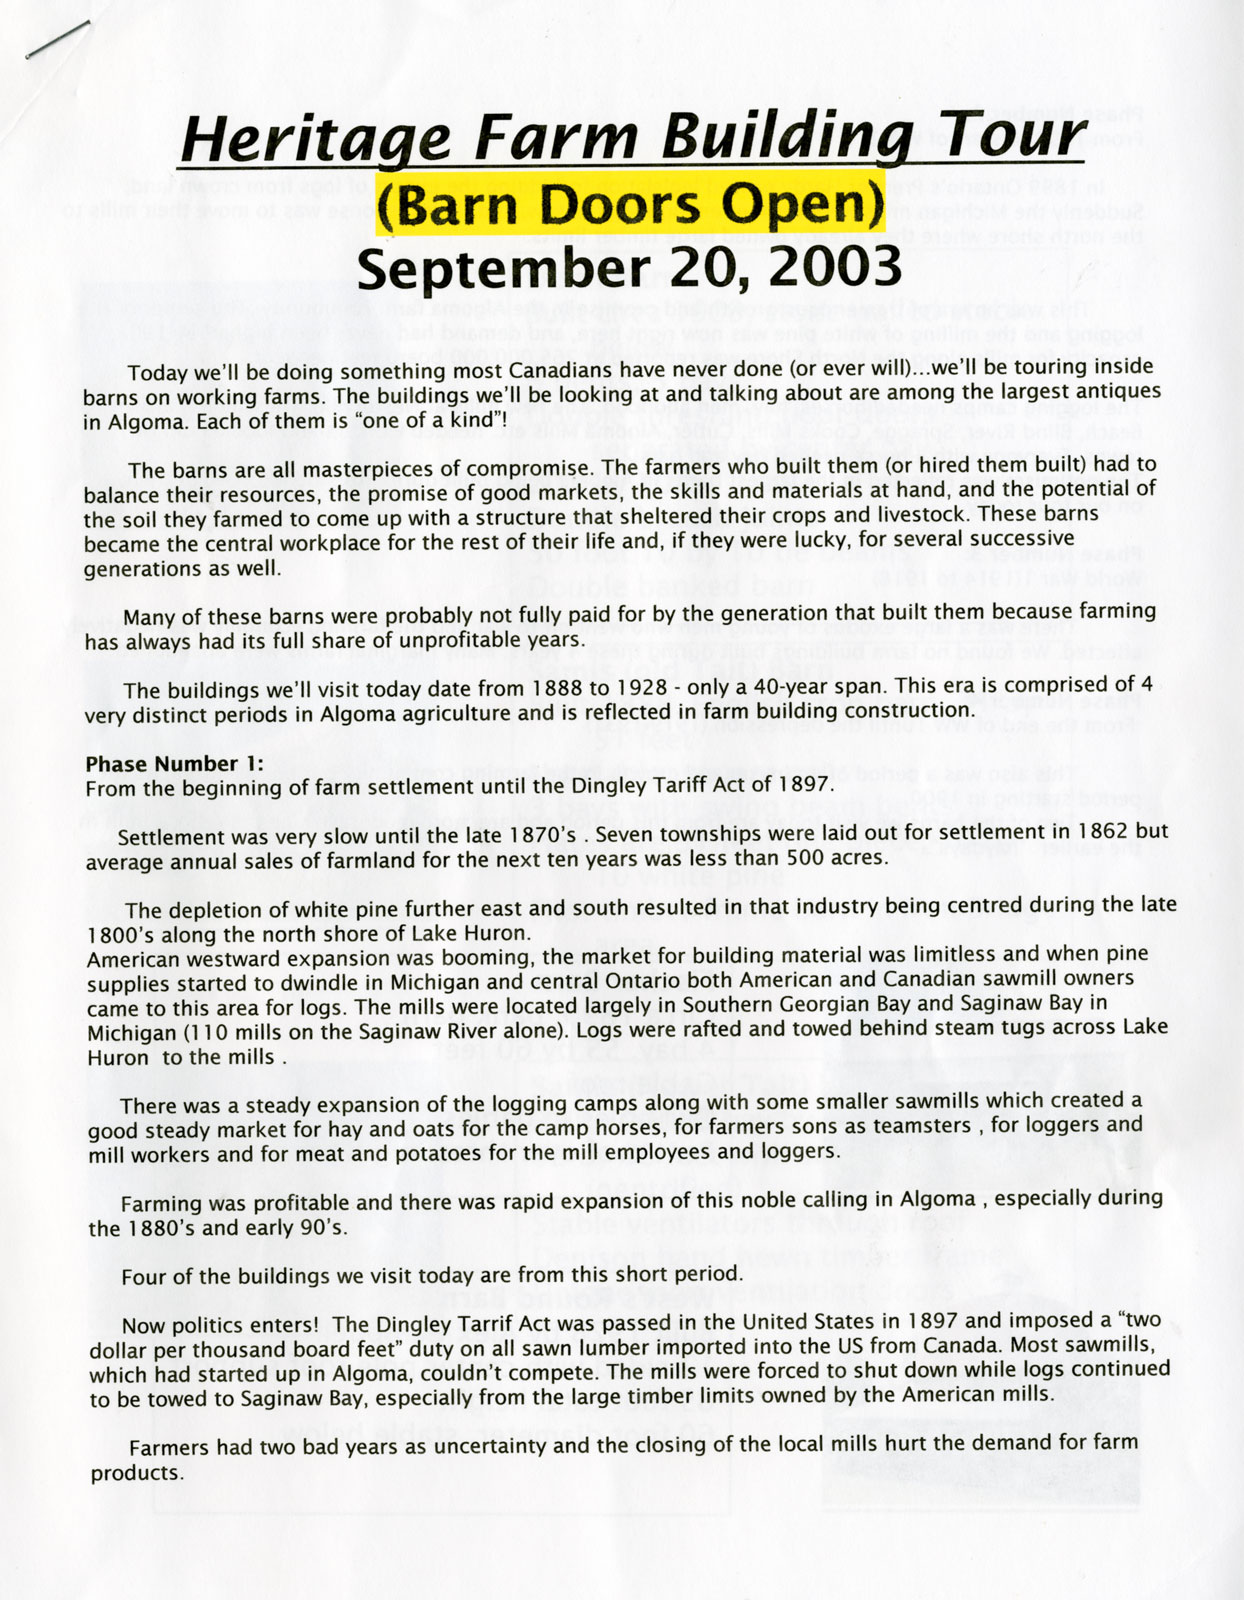 Heritage Barn Building Tour, Huron Shores, 2003